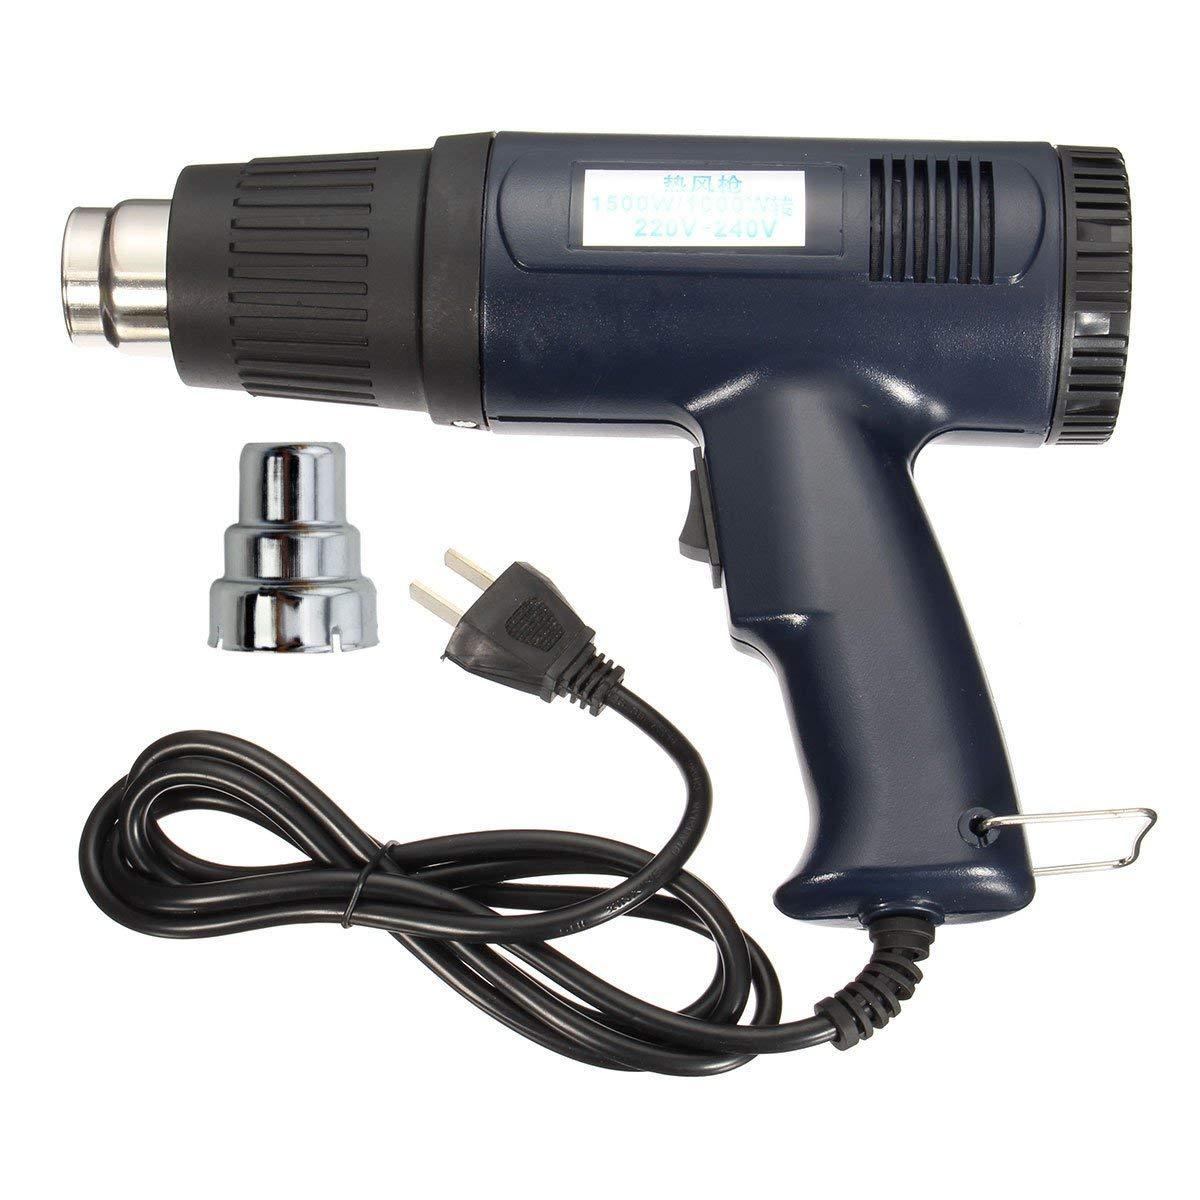 Tools Cheap Sale Air Blow Gun Pistol Trigger Cleaner Compressor Dust Blower Pneumatic Pressure Cleaning Gun Spray Cleaning Tools Spray Guns #1128